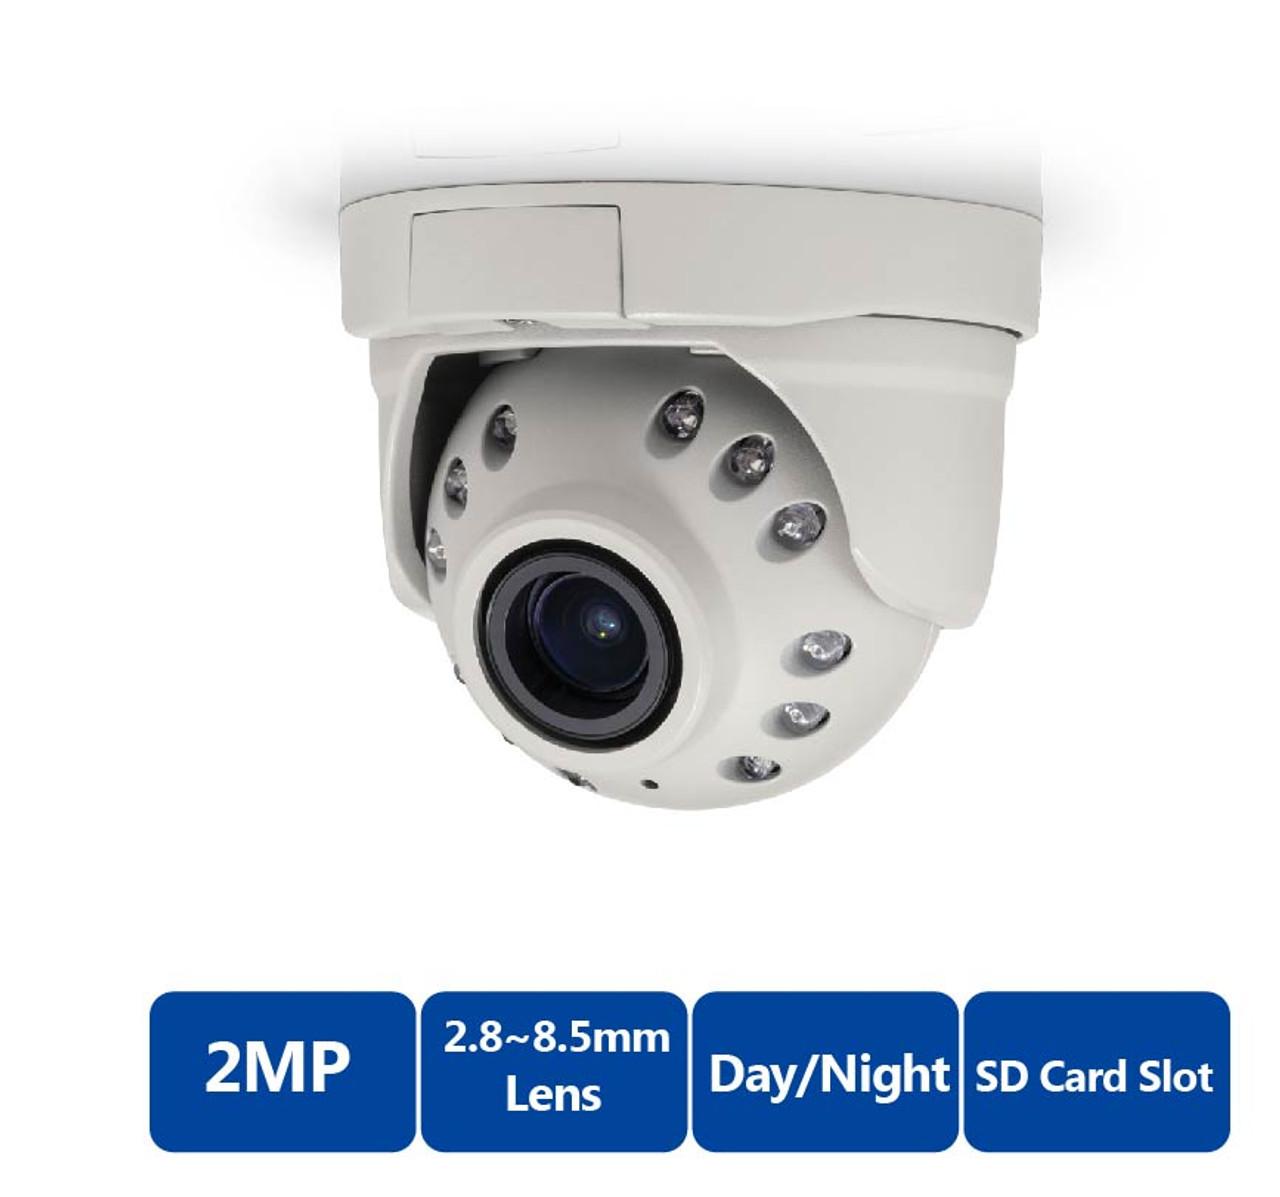 ARECONT VISION AV2245PMIR-SB-LG IP CAMERA DOWNLOAD DRIVERS